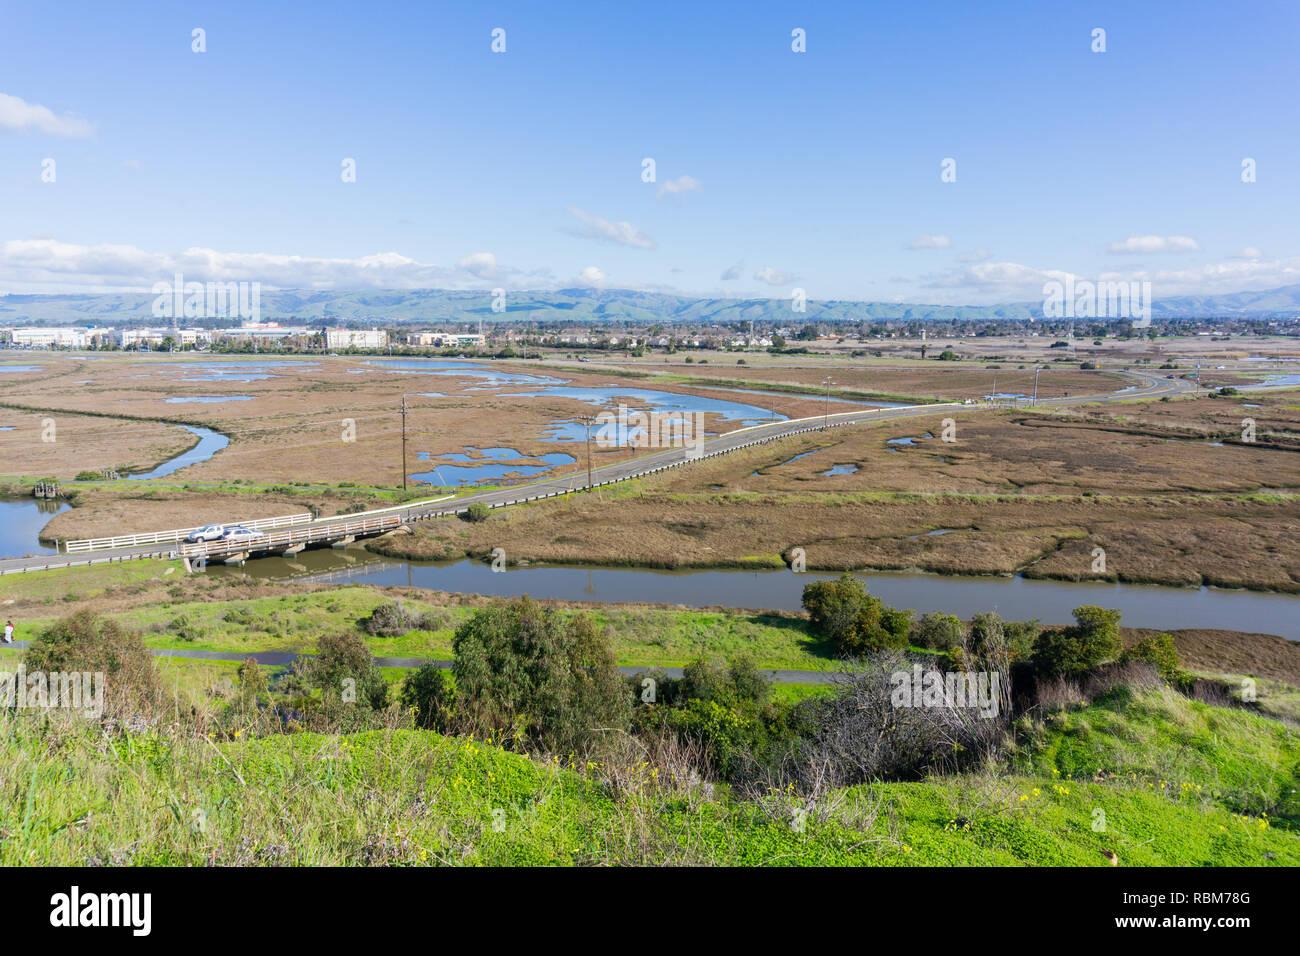 Wetlands in Don Edwards wildlife refuge, Fremont, San Francisco bay area, California Stock Photo